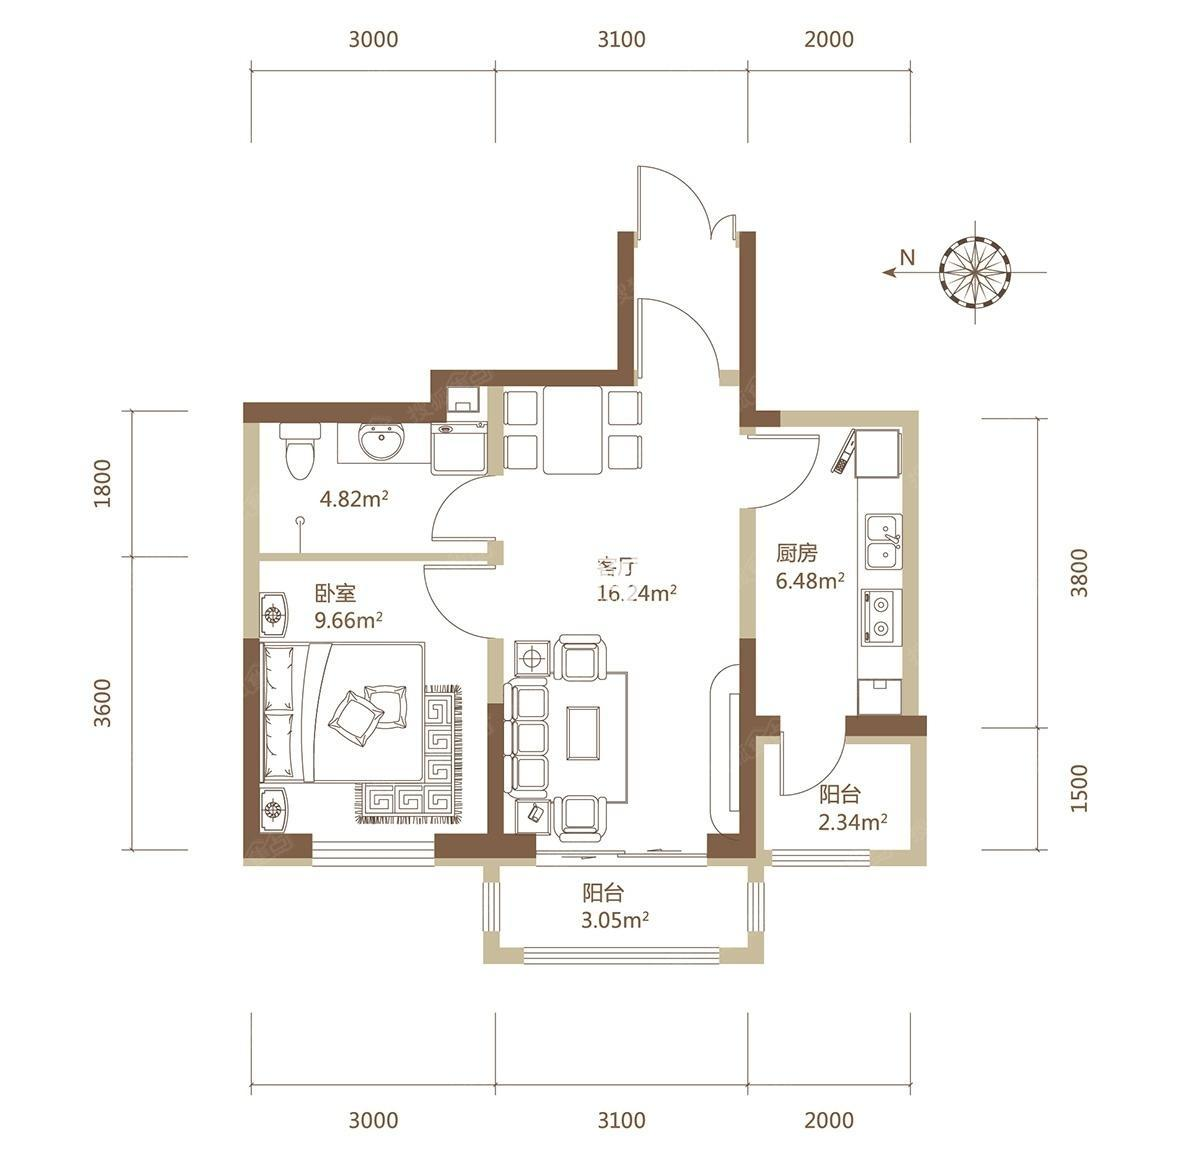 A1栋F户型建筑面积69.14平米一居户型